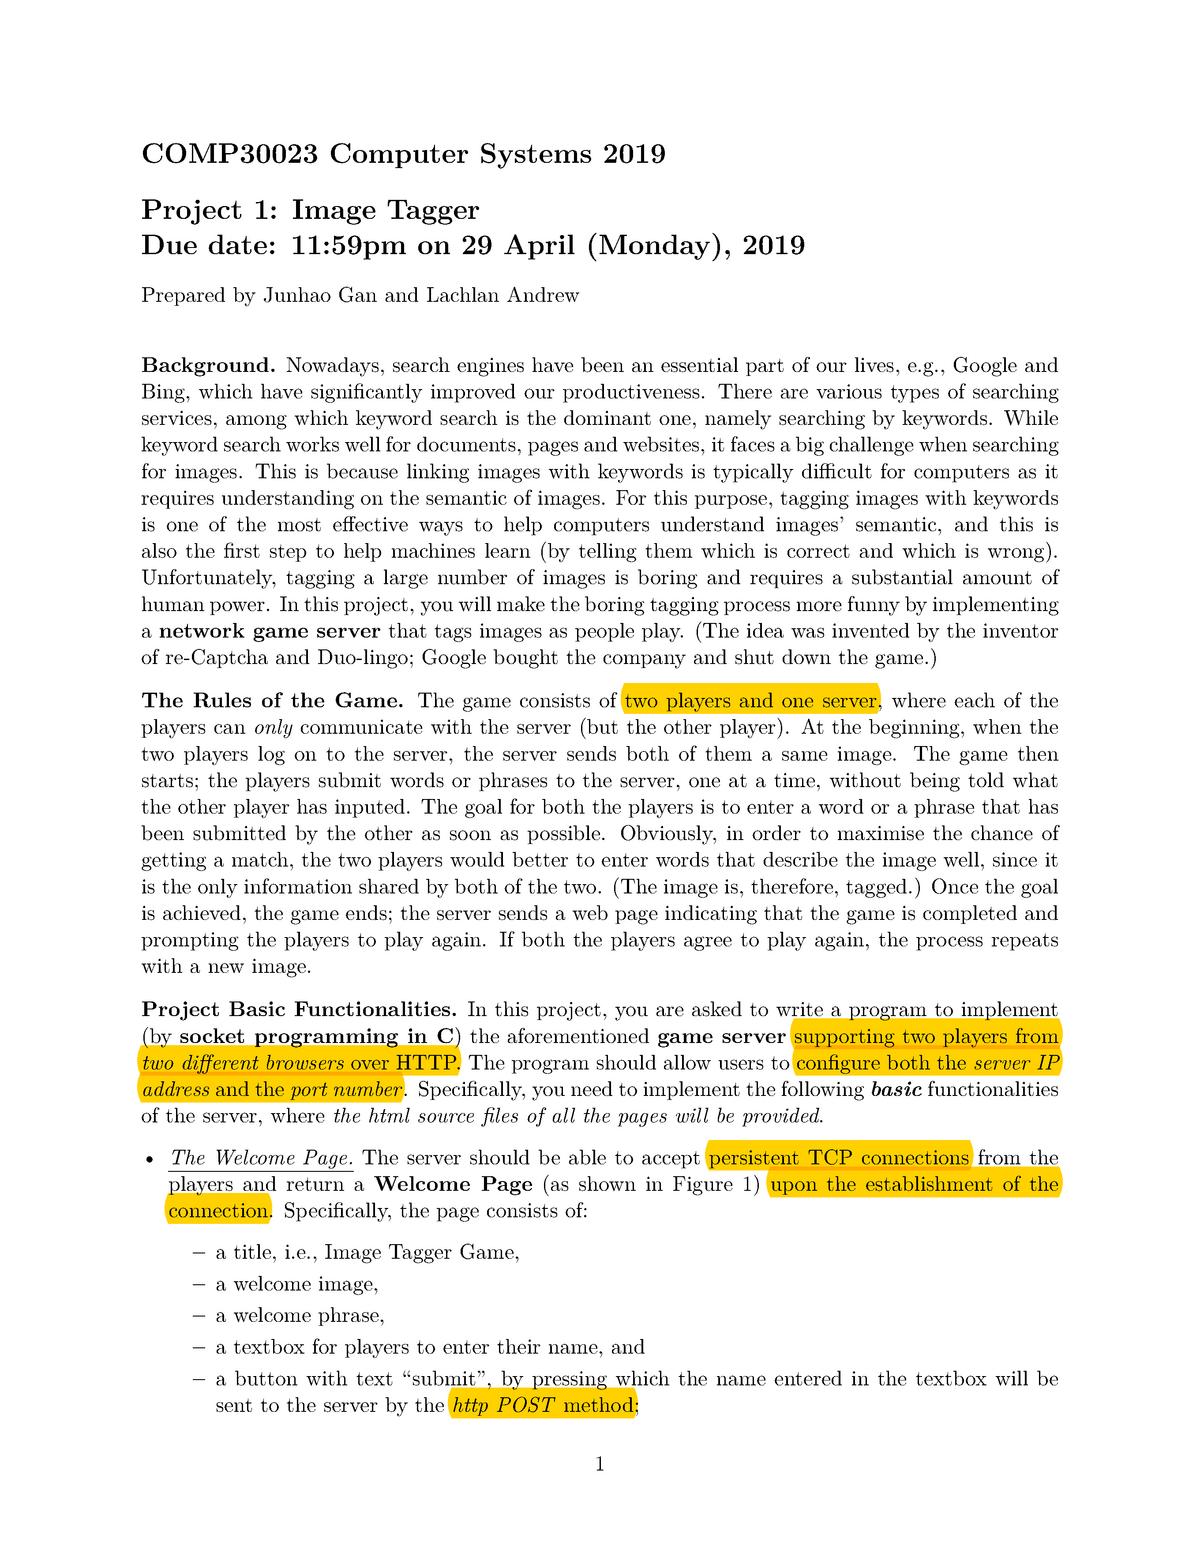 Project 1 spec - COMP30023: Computer Systems - StuDocu